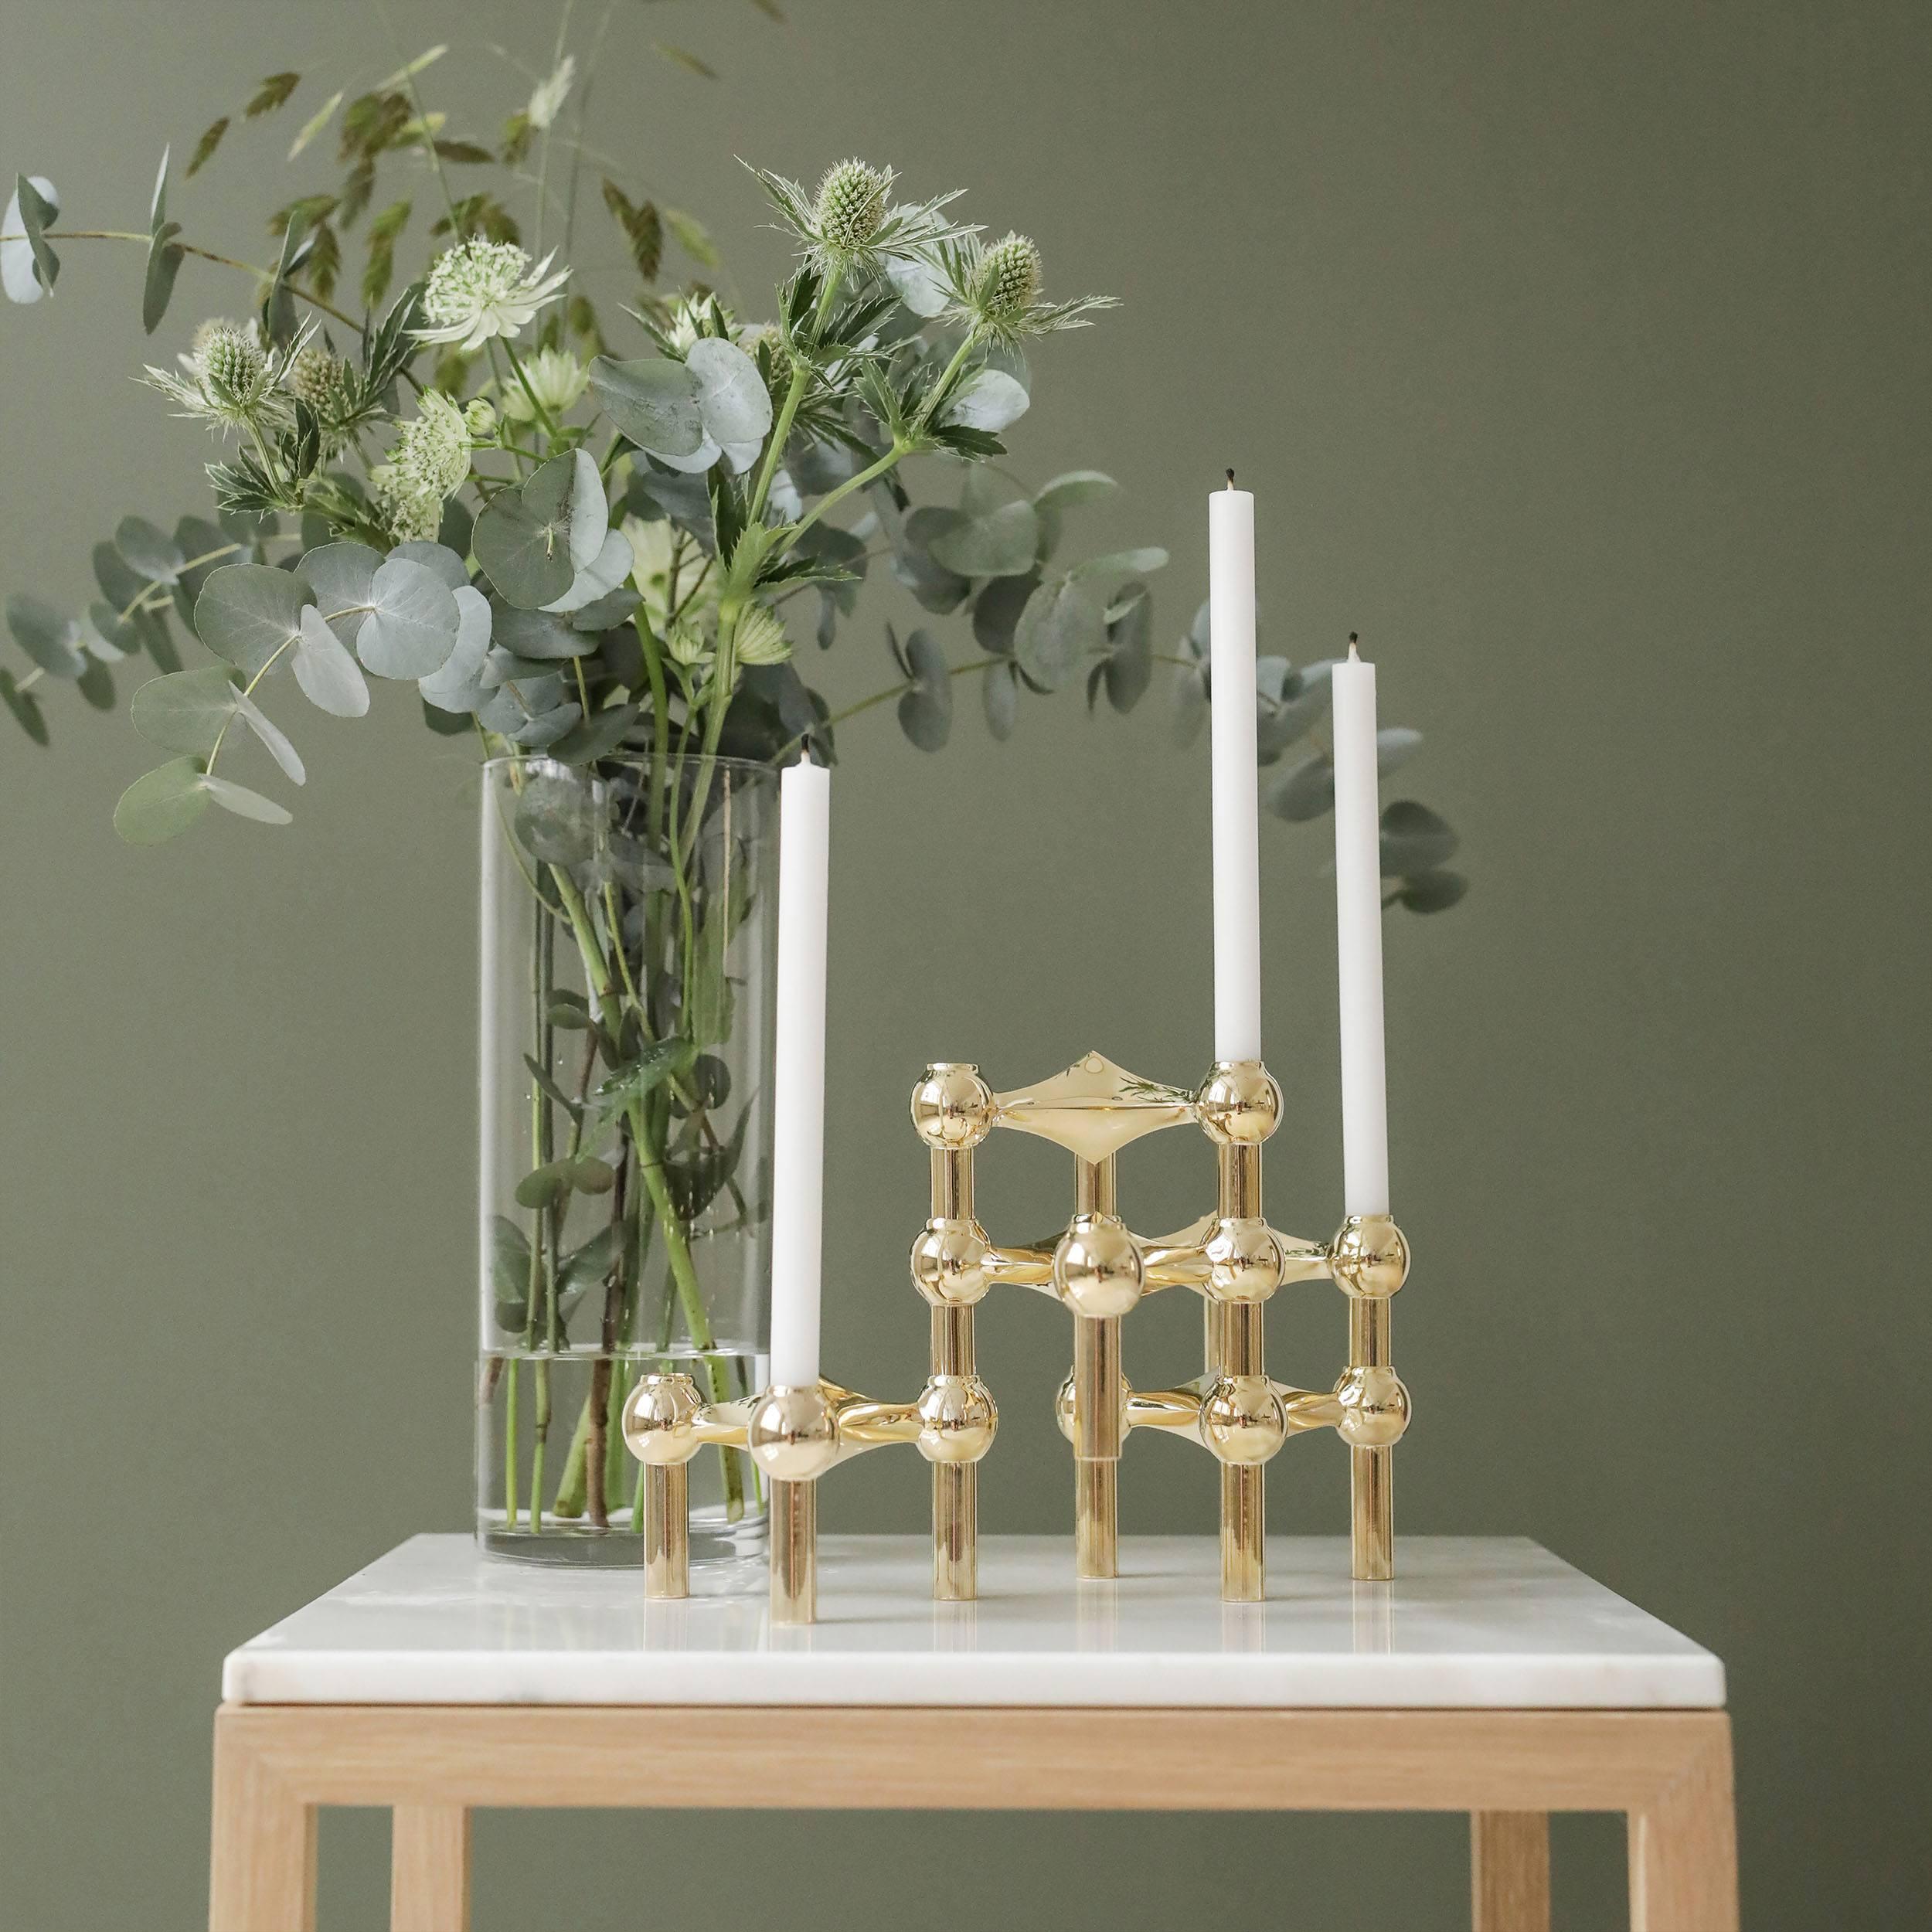 Stoff Kerzen im 12er-Set